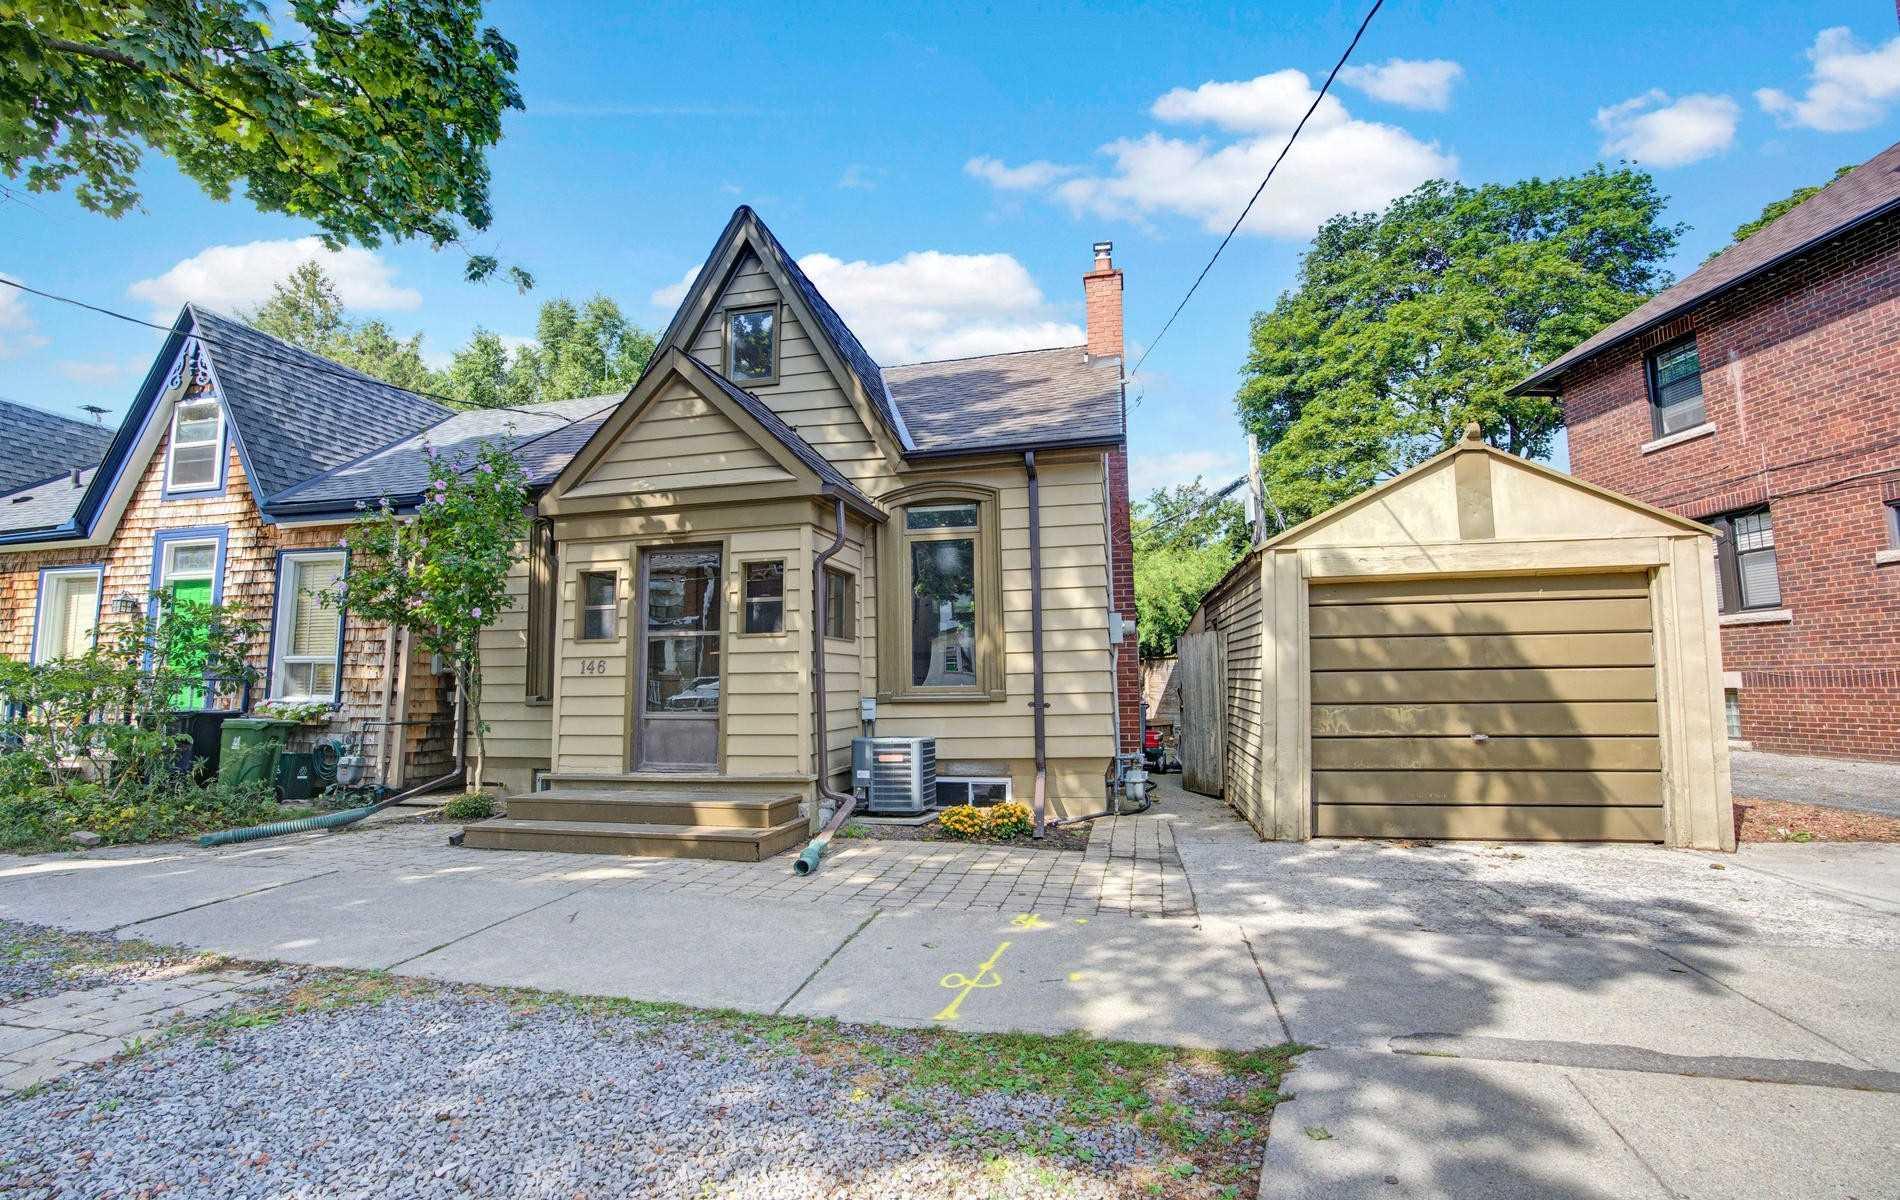 146 Cambridge Ave, Toronto, Ontario M4K2L8, 2 Bedrooms Bedrooms, 7 Rooms Rooms,3 BathroomsBathrooms,Detached,For Sale,Cambridge,E4892335